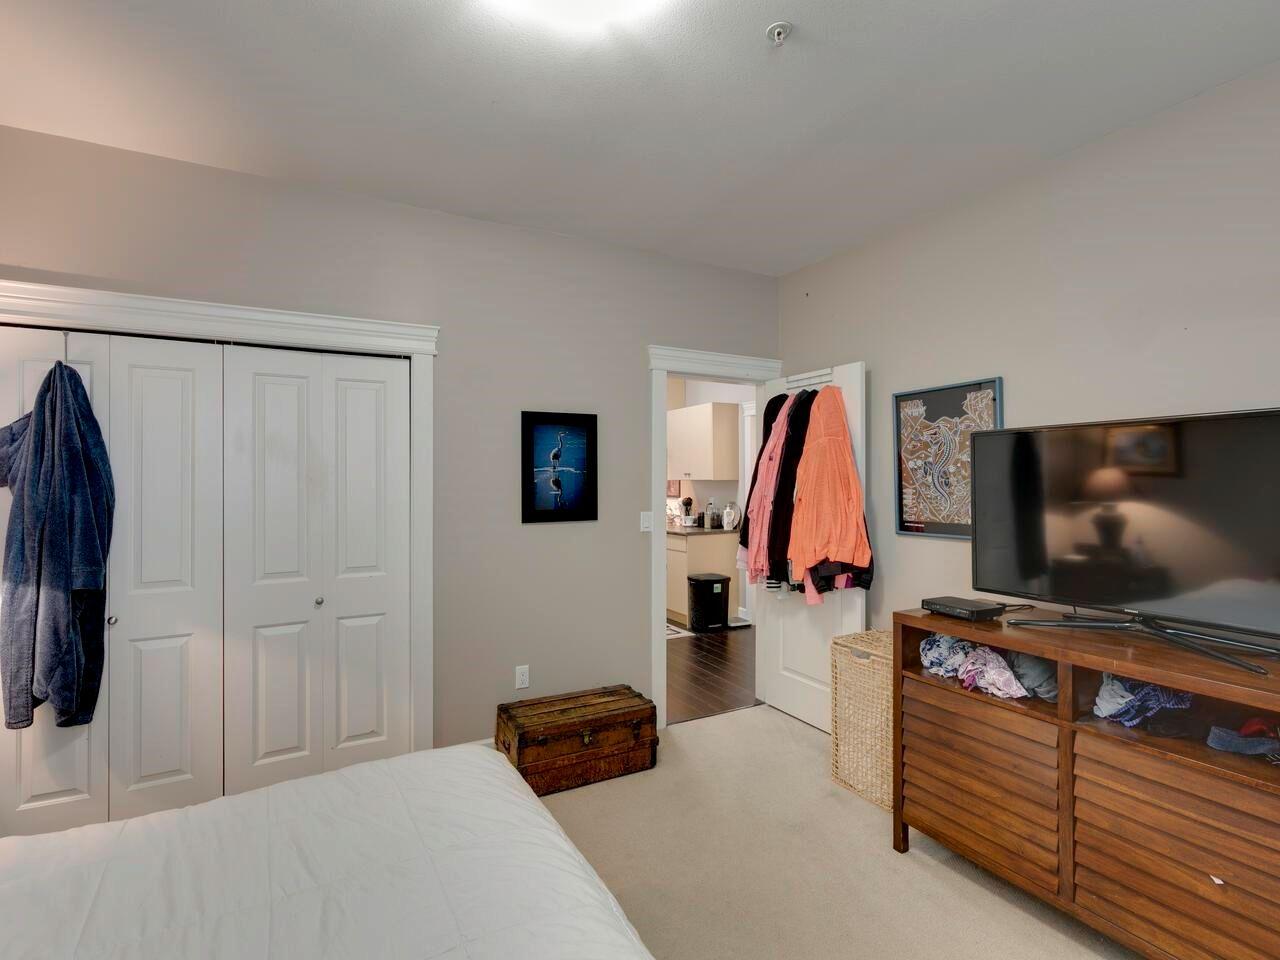 "Photo 27: Photos: 22845 126B Avenue in Maple Ridge: East Central House for sale in ""EAST CENTRAL MAPLE RIDGE"" : MLS®# R2594638"